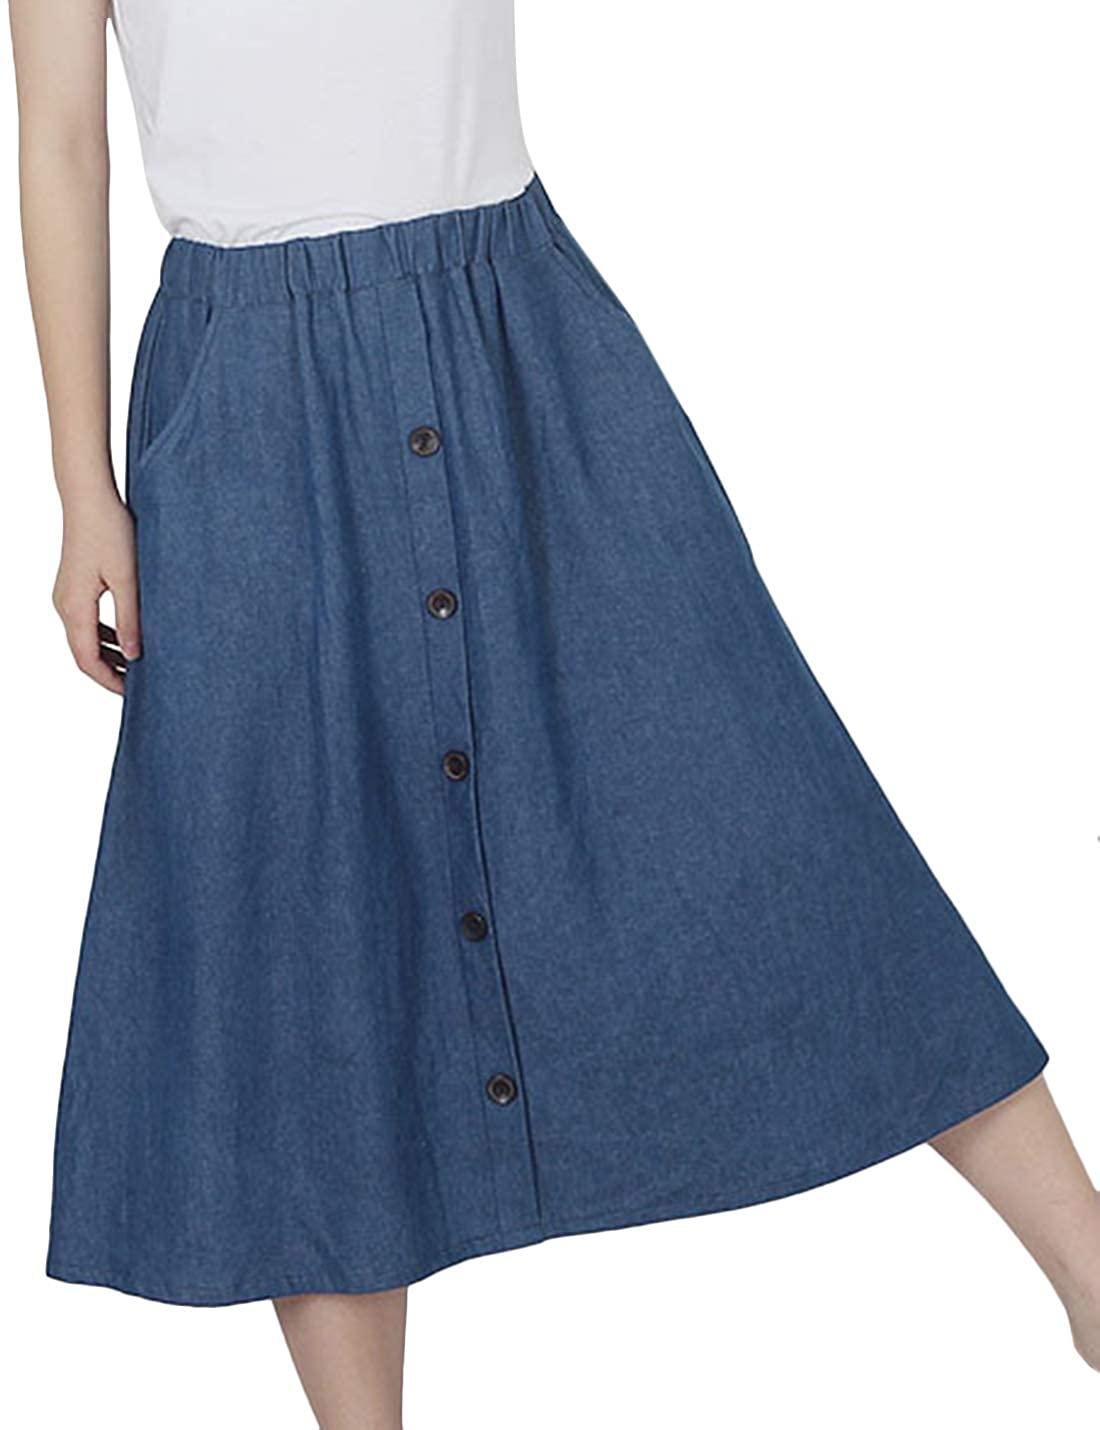 Tanming Womens Summer Retro Elastic Waist Button Mid Long Midi Pleated Denim Skirt